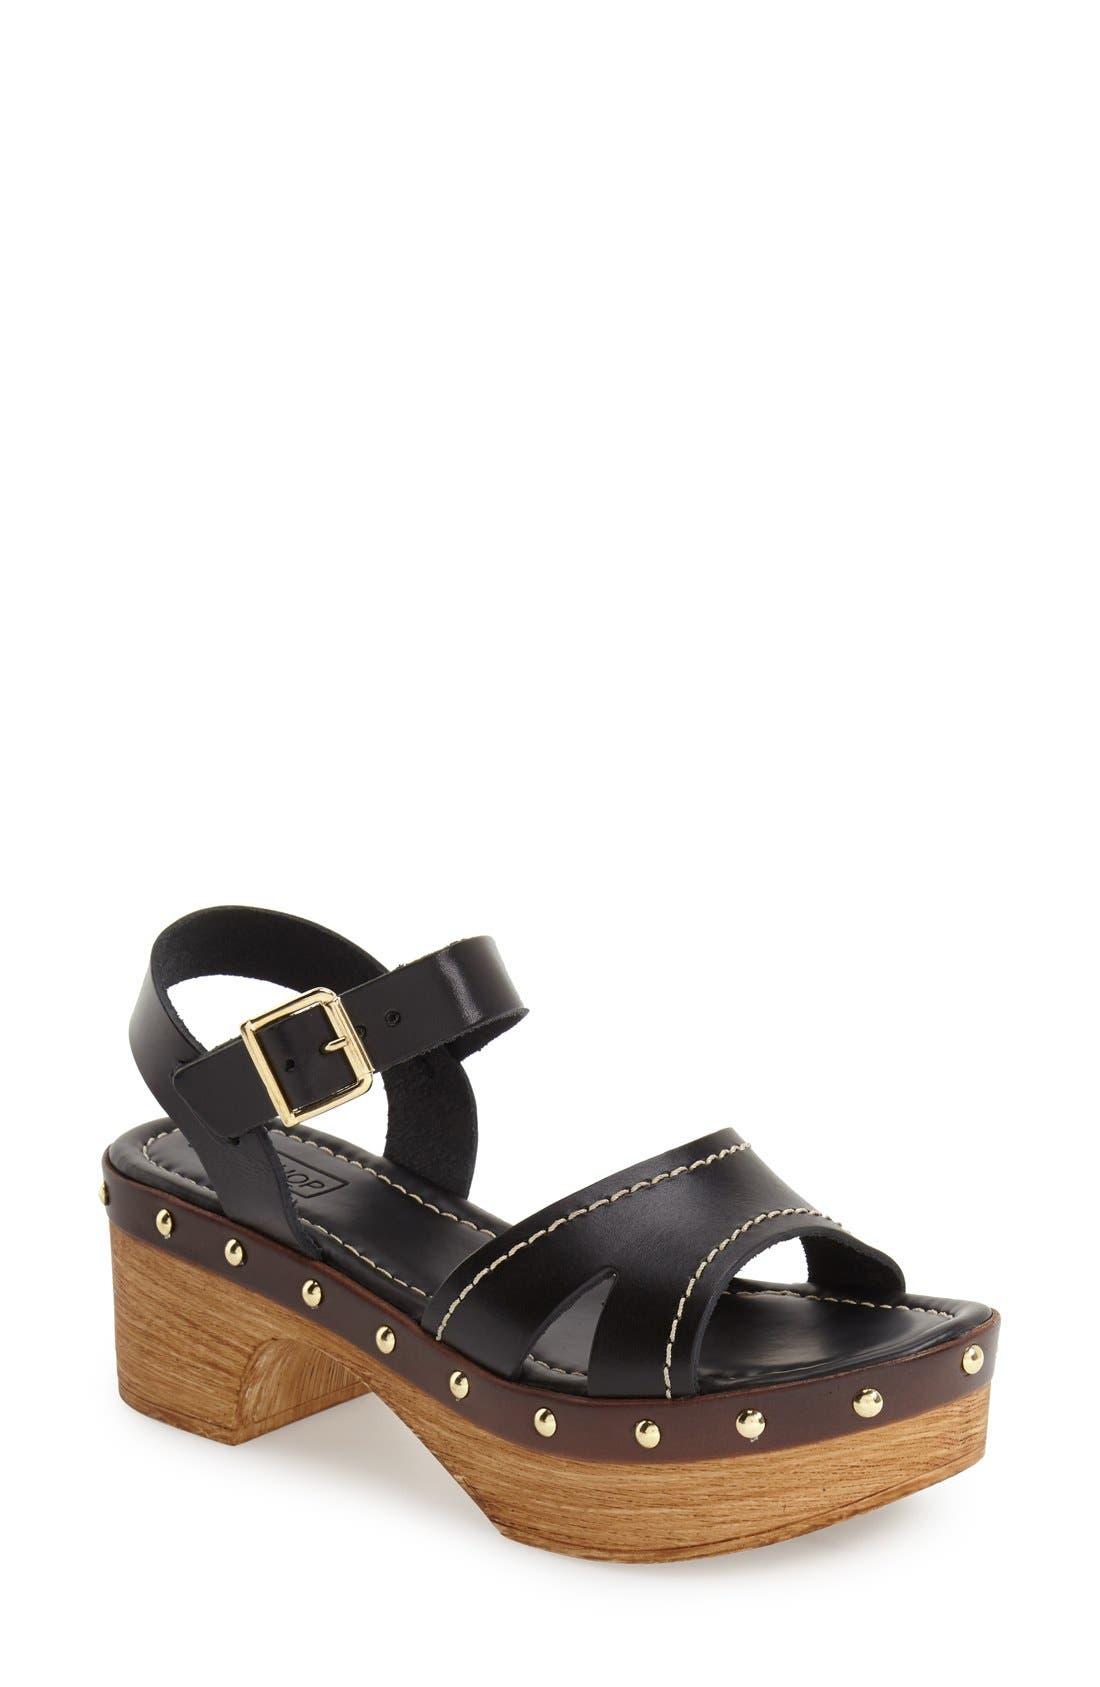 TOPSHOP VIV Clog Sandals